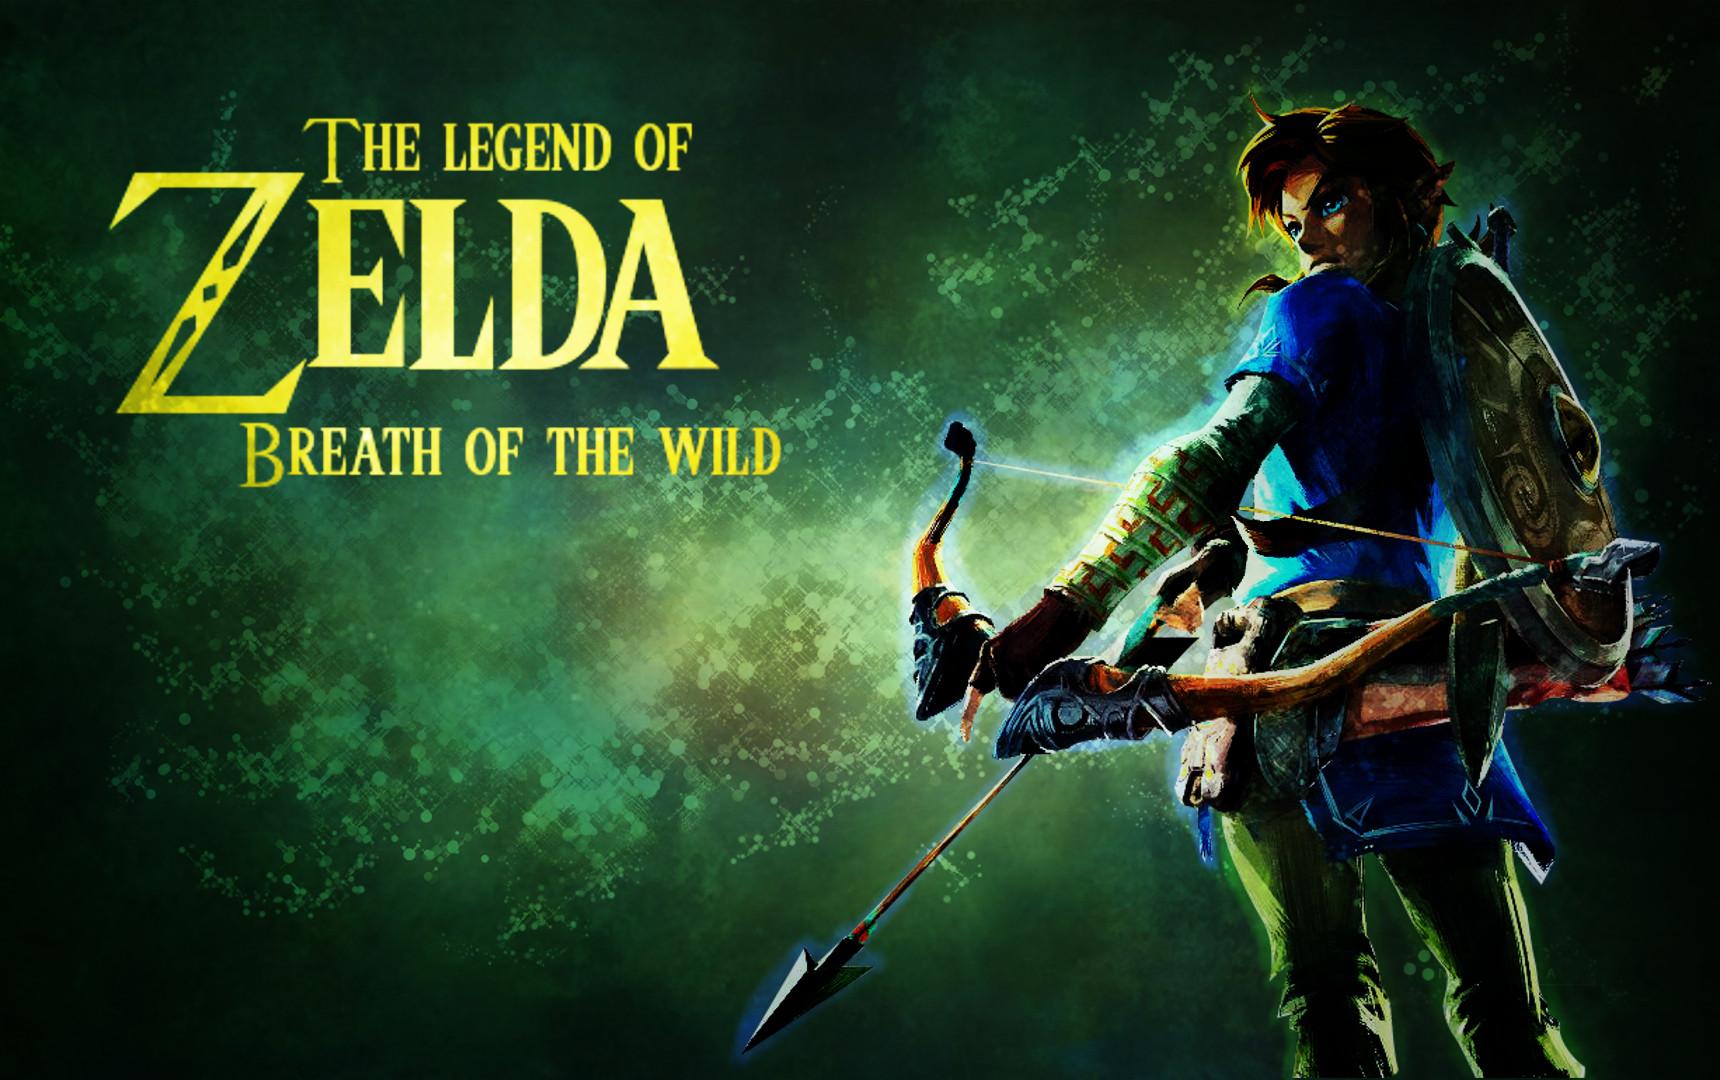 Zelda Breath Of The Wild Wallpaper By Mattsquat On Deviantart